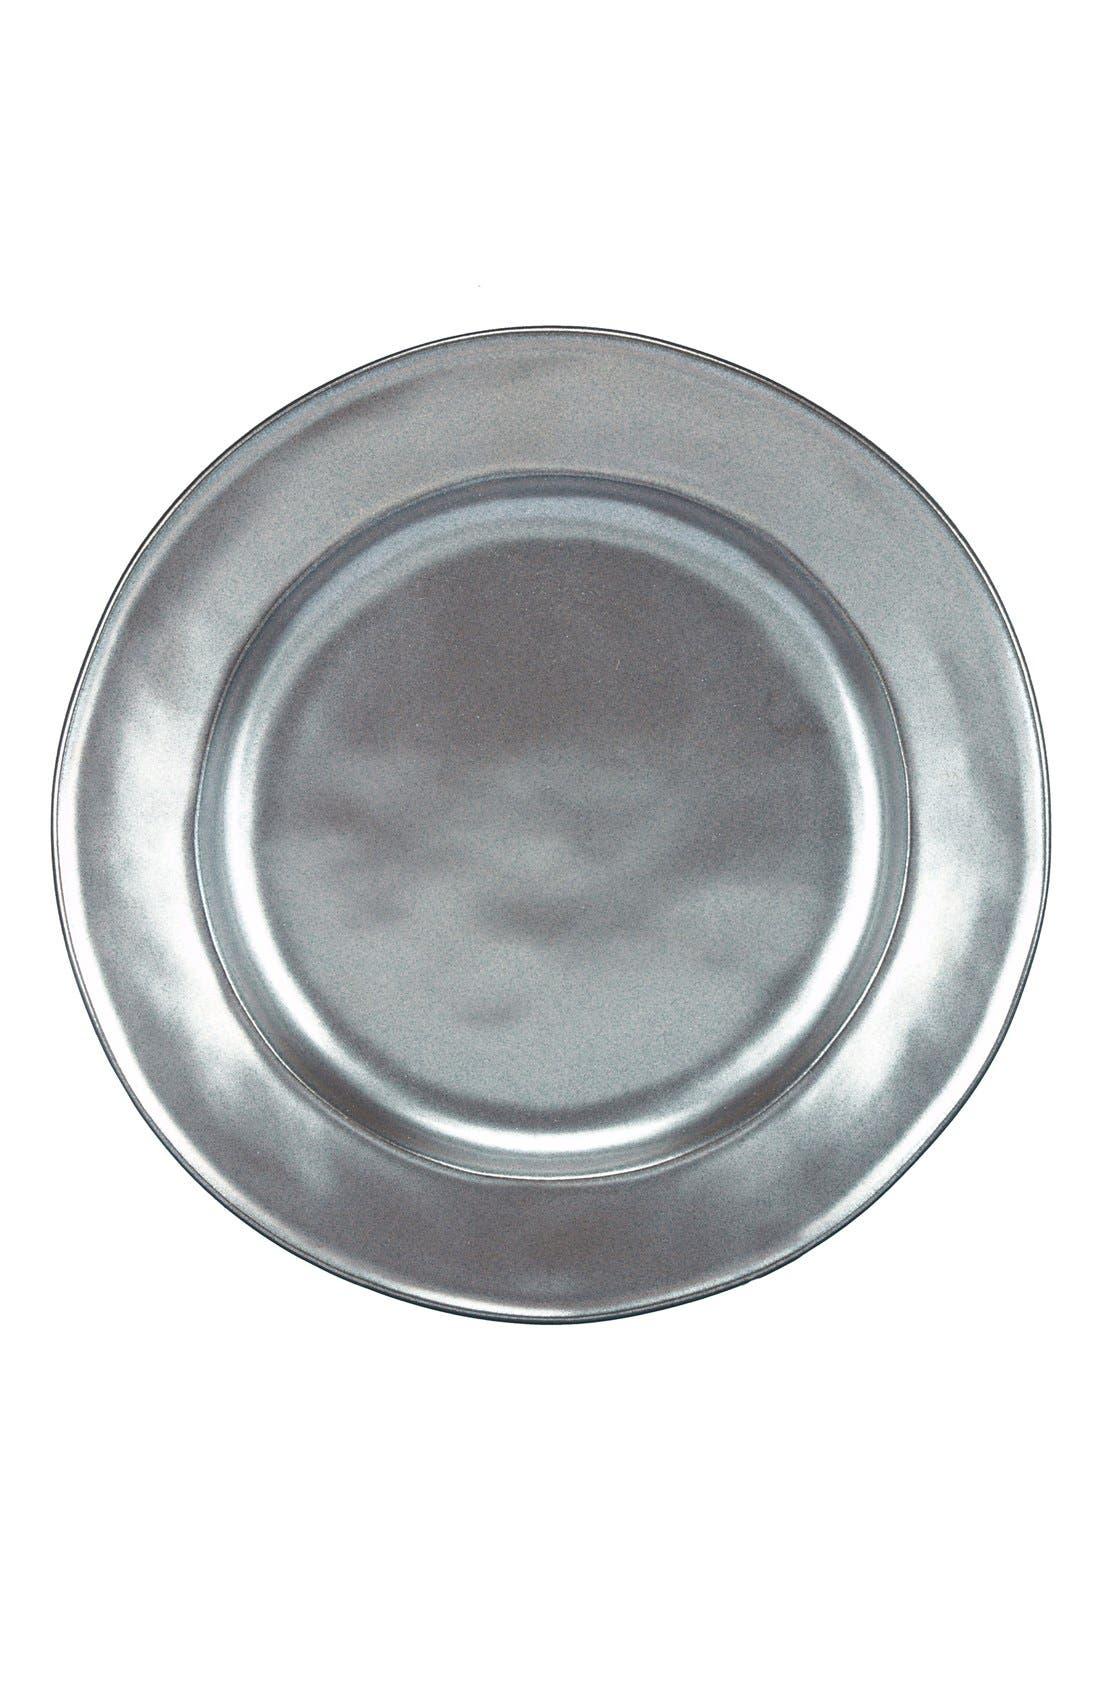 Main Image - Juliska 'Pewter' Ceramic Salad Plate